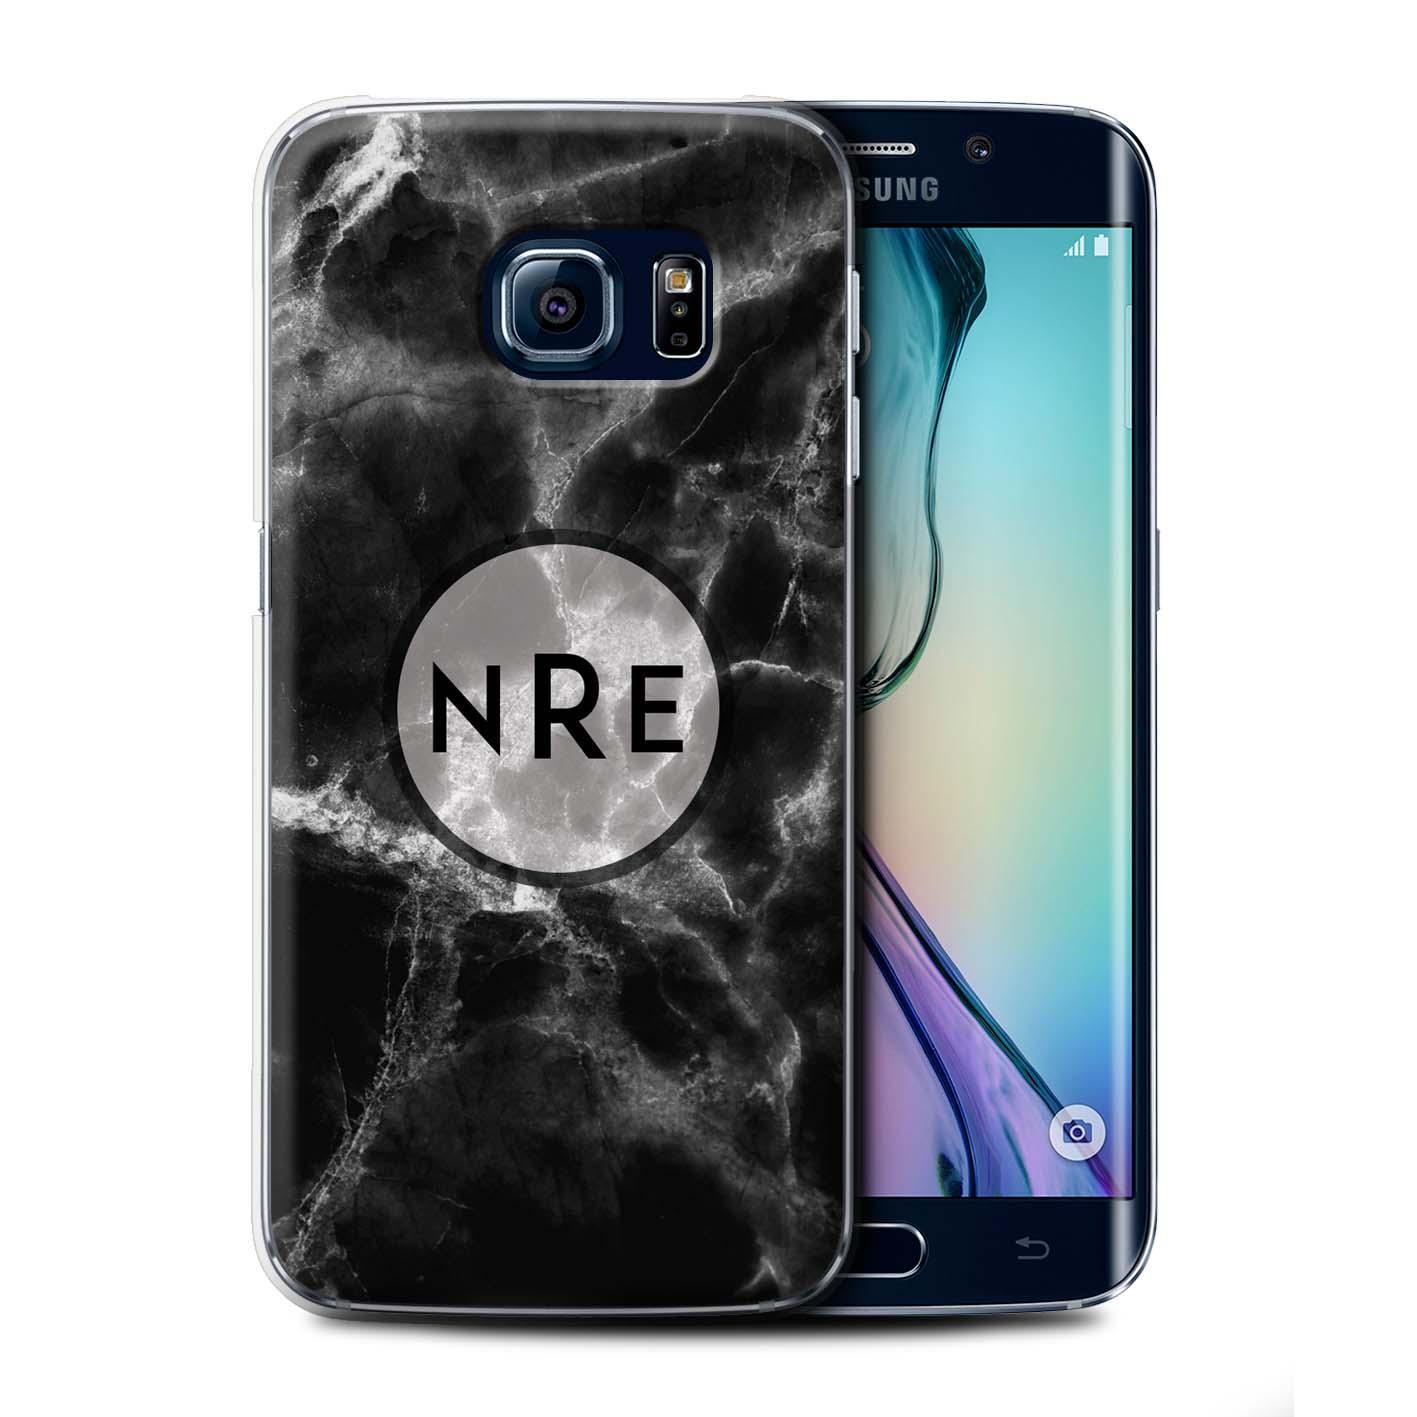 Personalisiert-Individuell-Marmor-Huelle-fuer-Samsung-Galaxy-S6-Edge-Plus-Etui